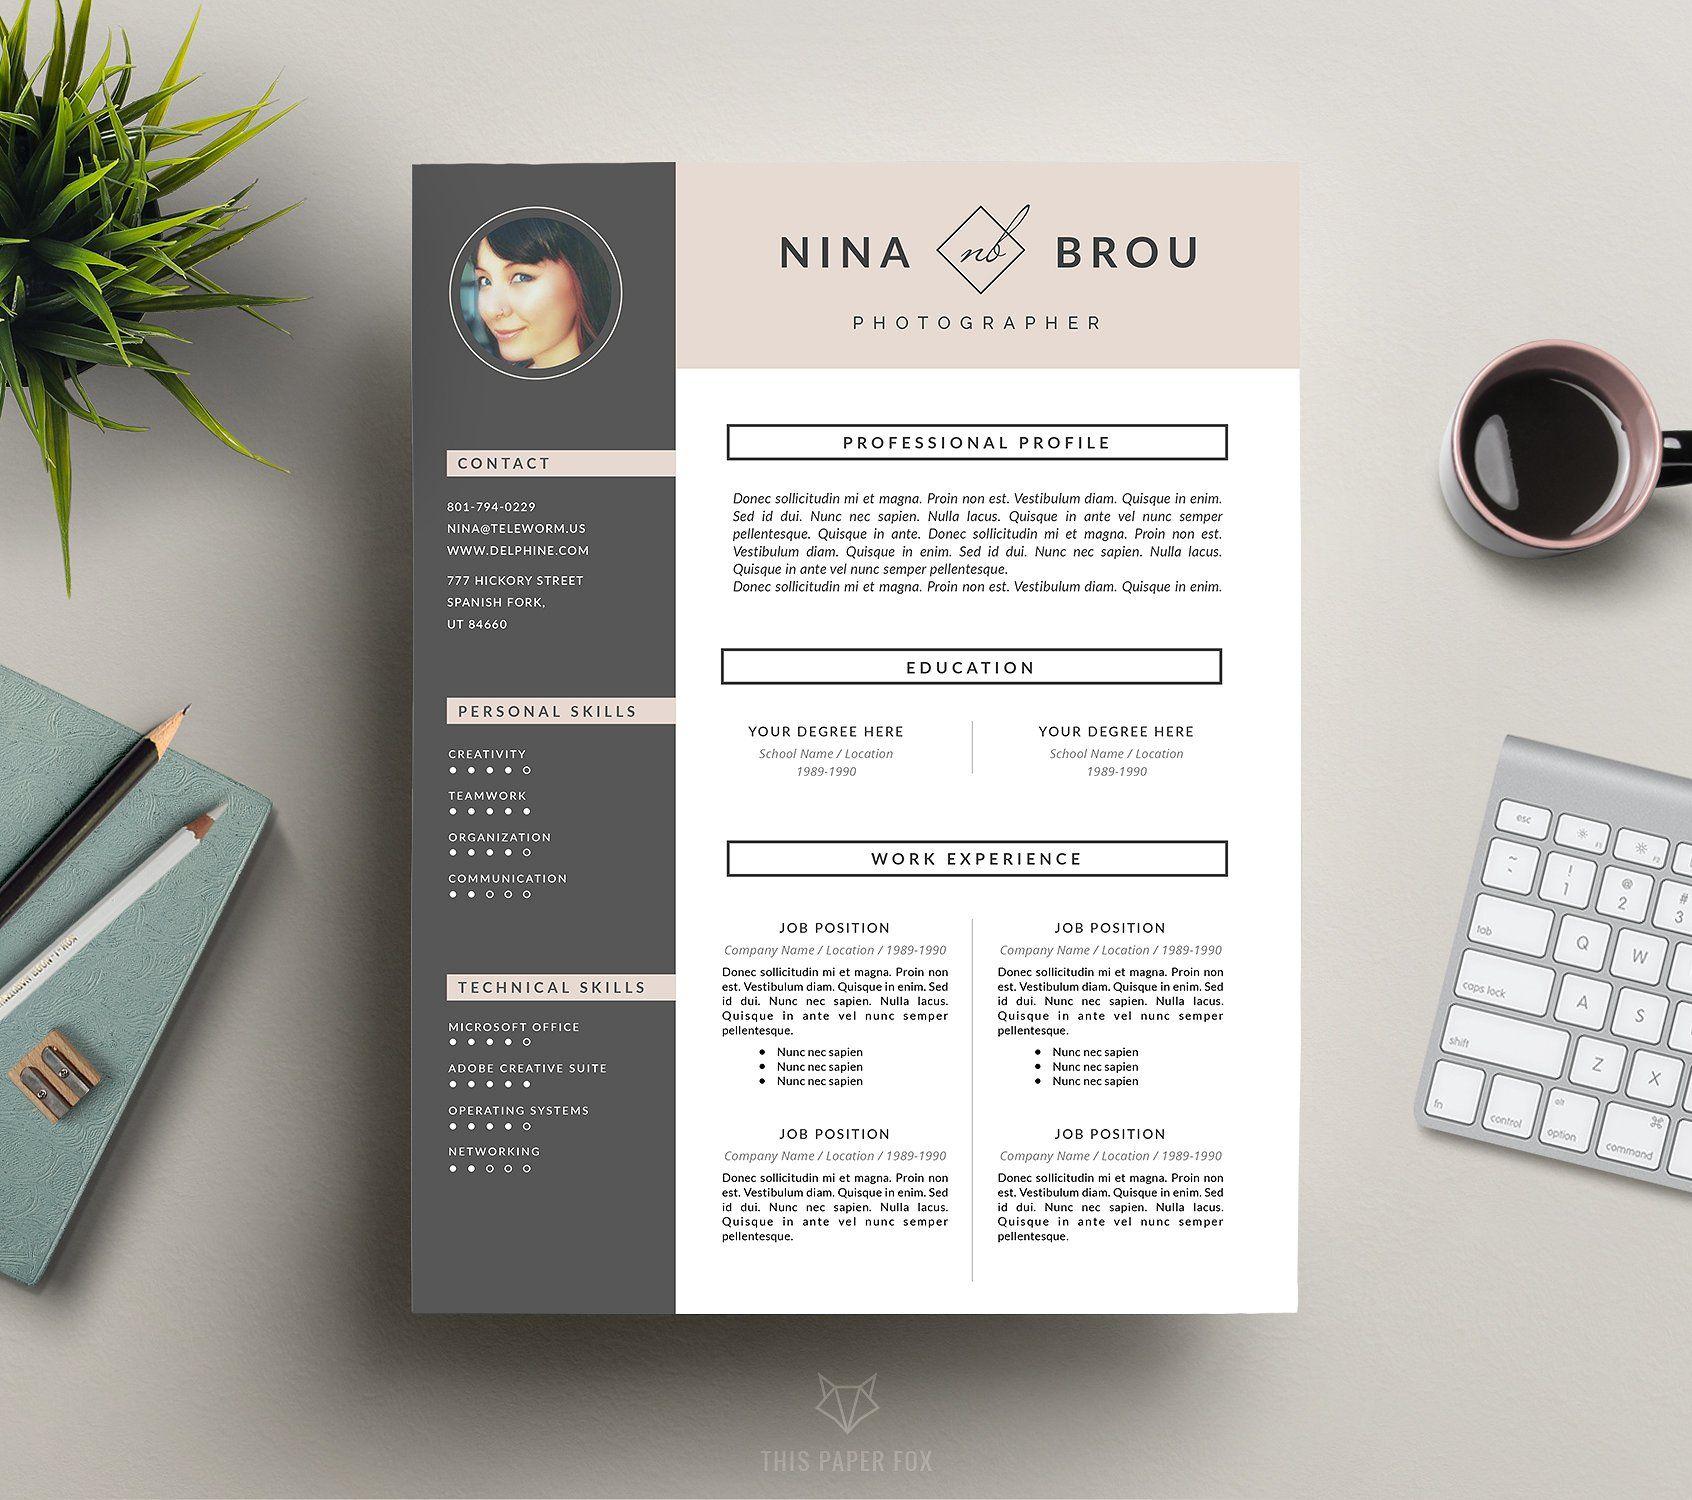 Feminine Resume Design | CV | Design resume, Resume cv and Brochures